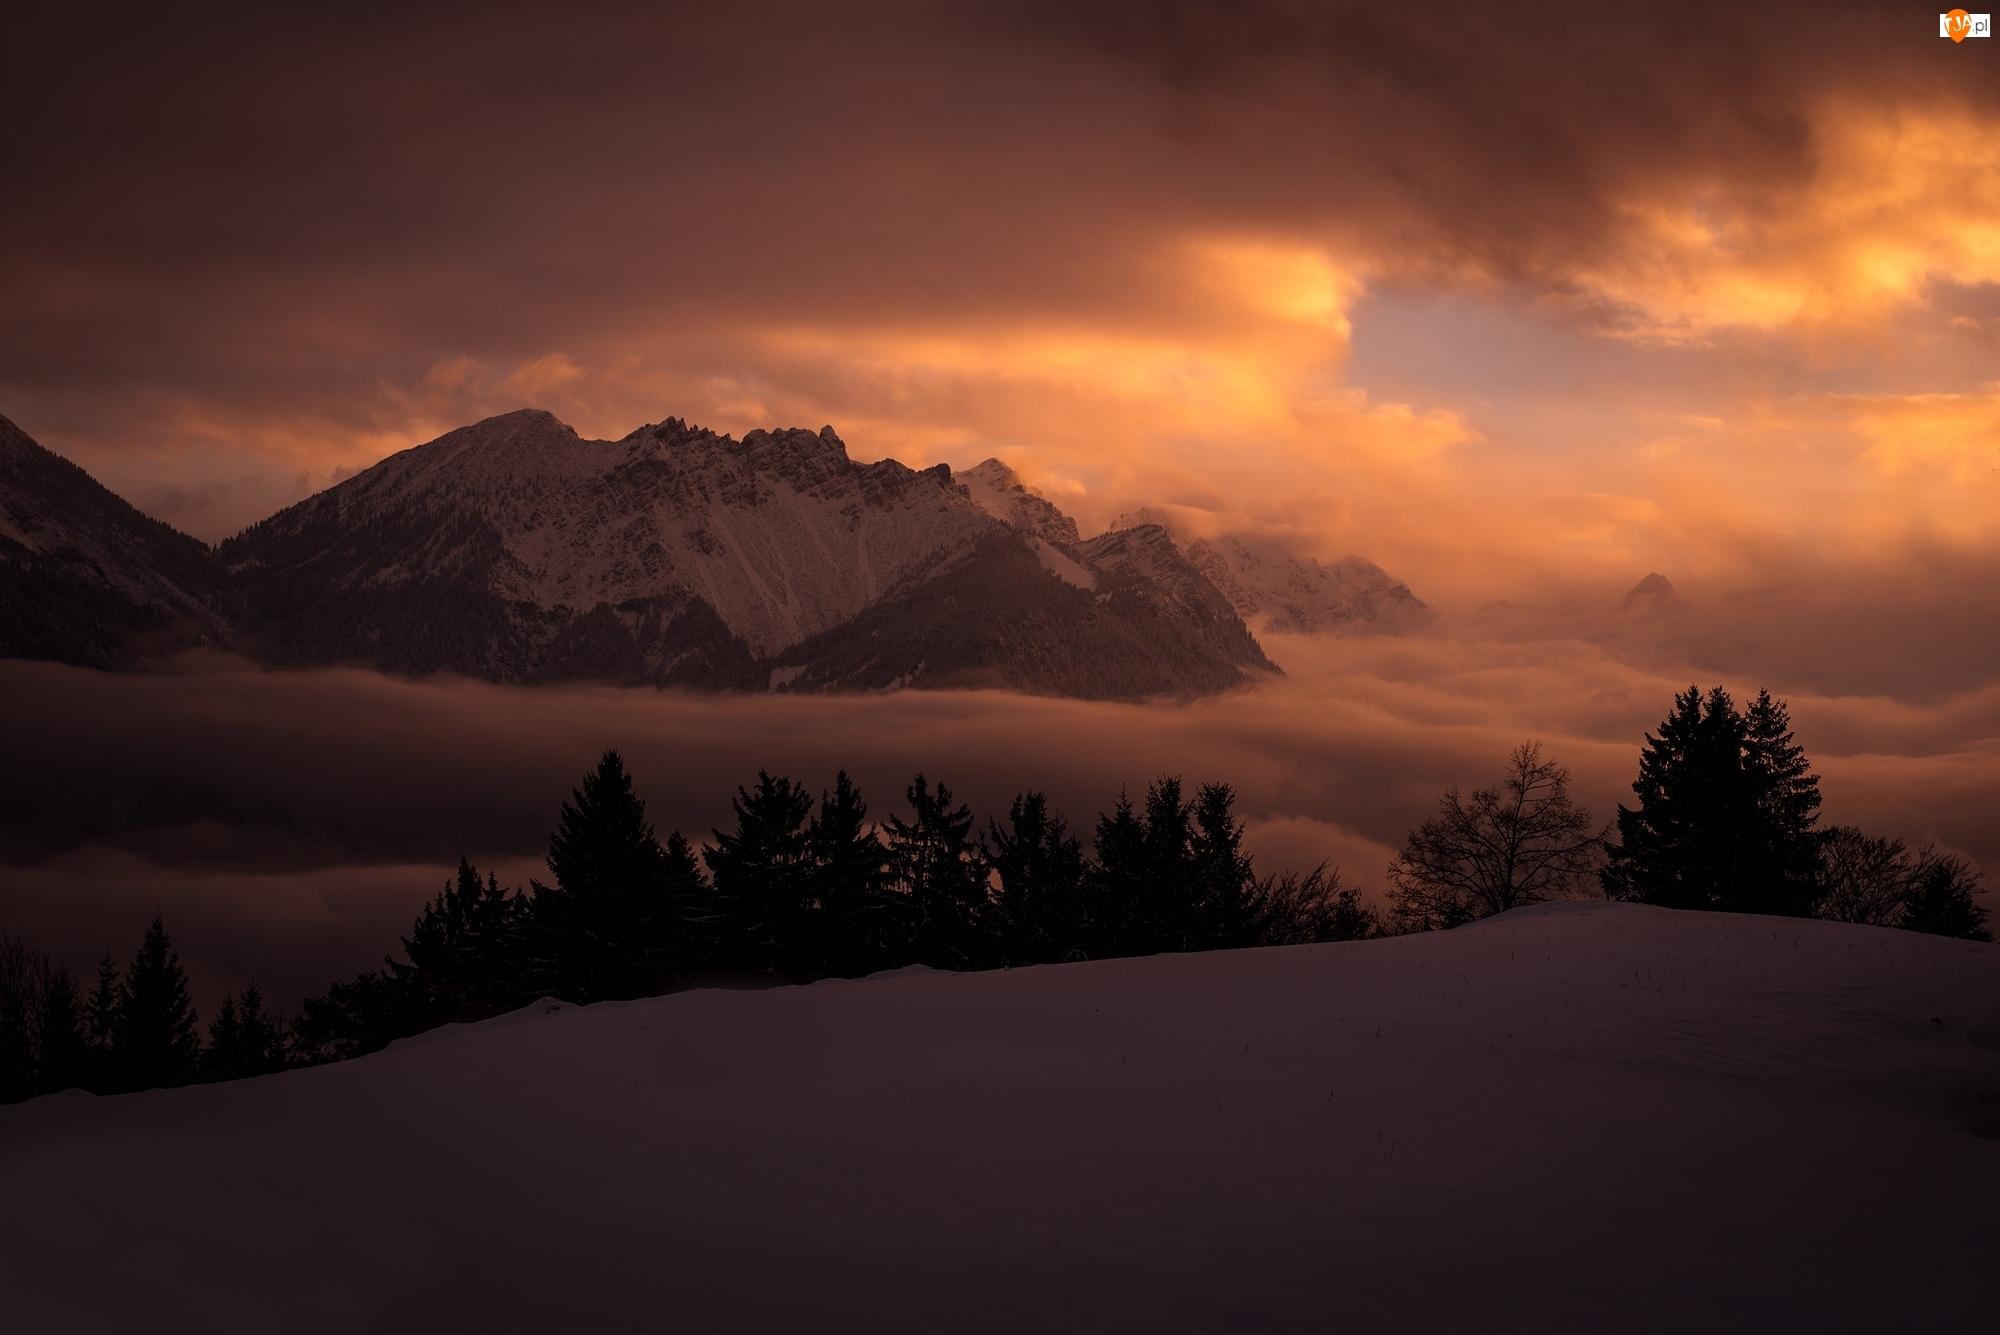 Zima, Zmrok, Góry, Chmury